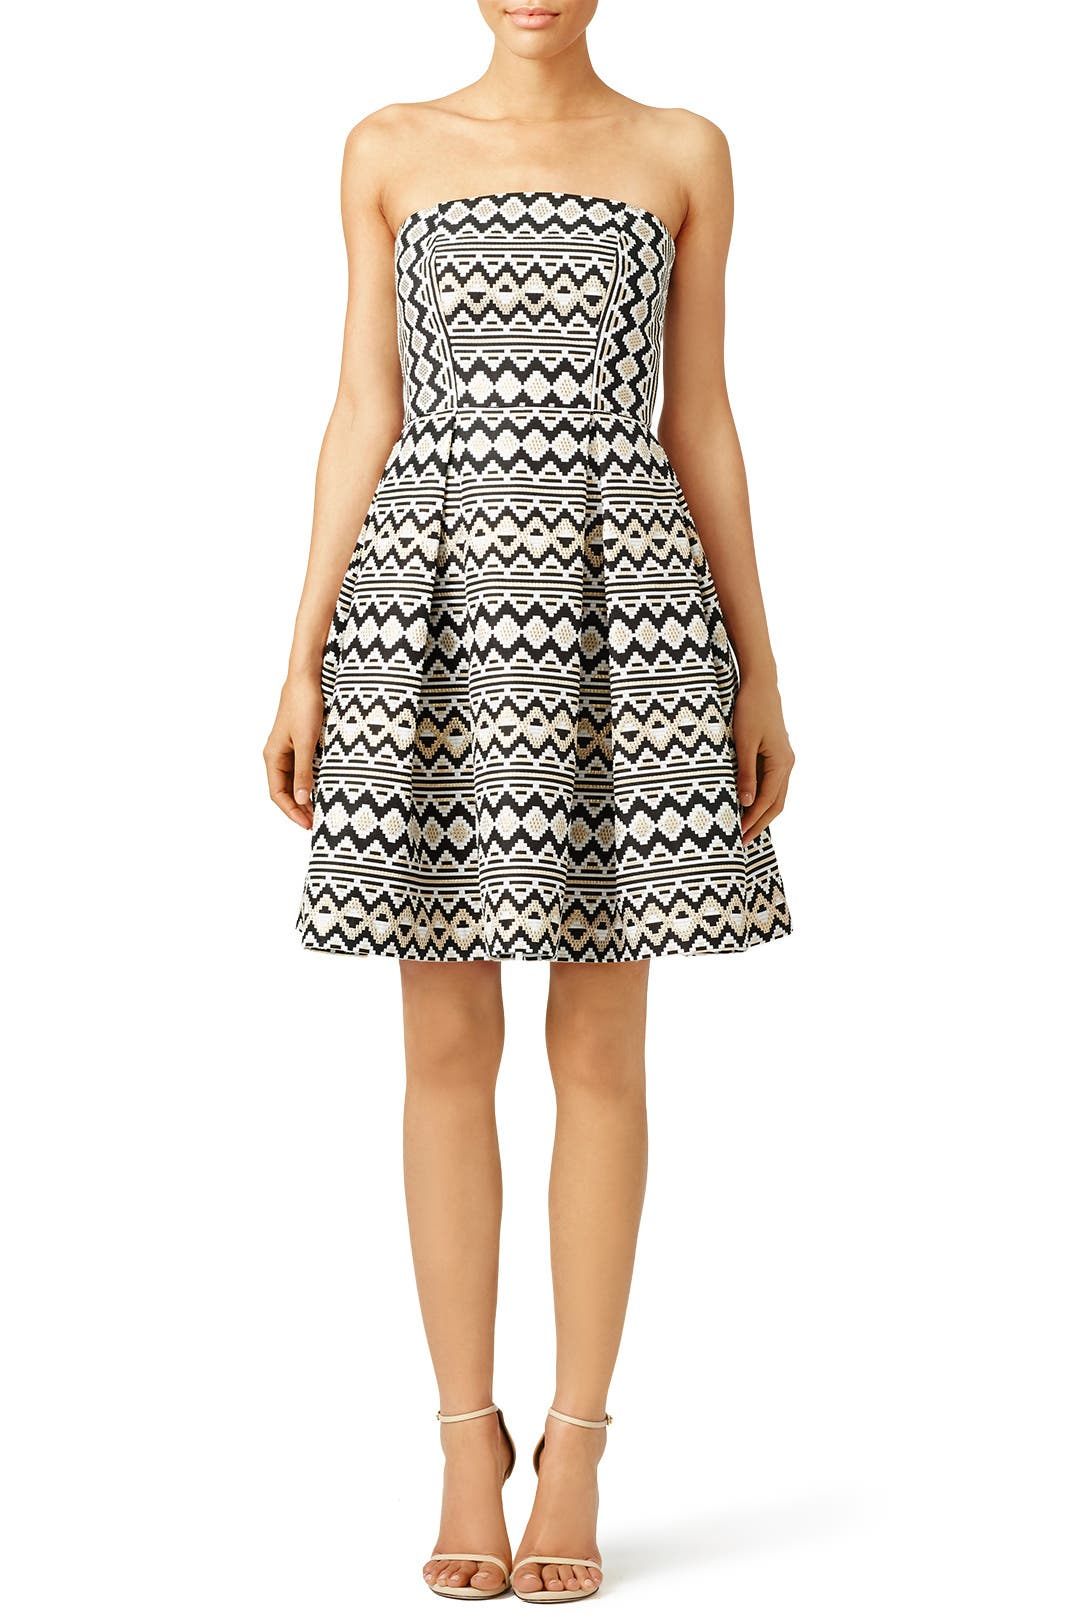 Slate & Willow Graphic Zain Dress